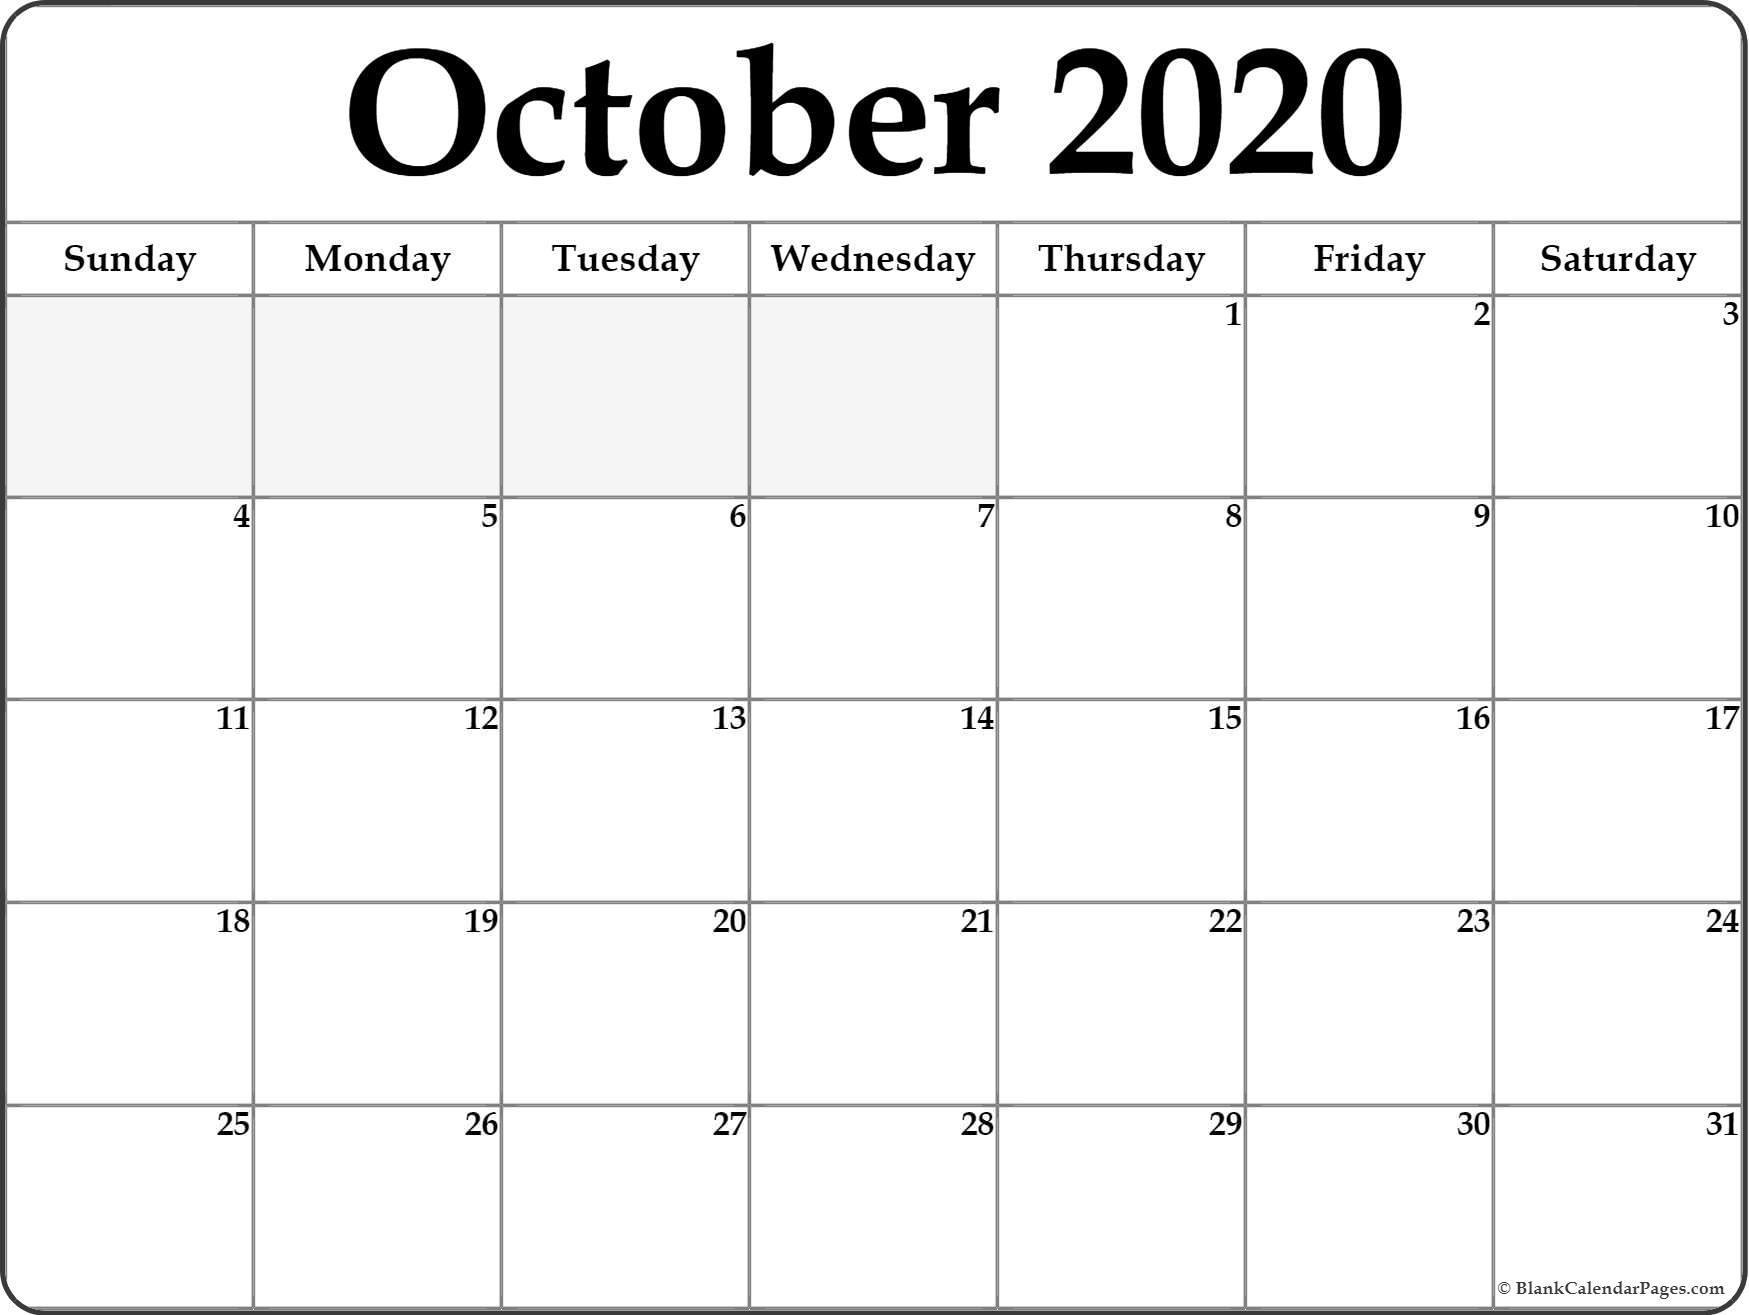 October 2020 Calendar | Free Printable Monthly Calendars_Monthly Calendar Blank 2020